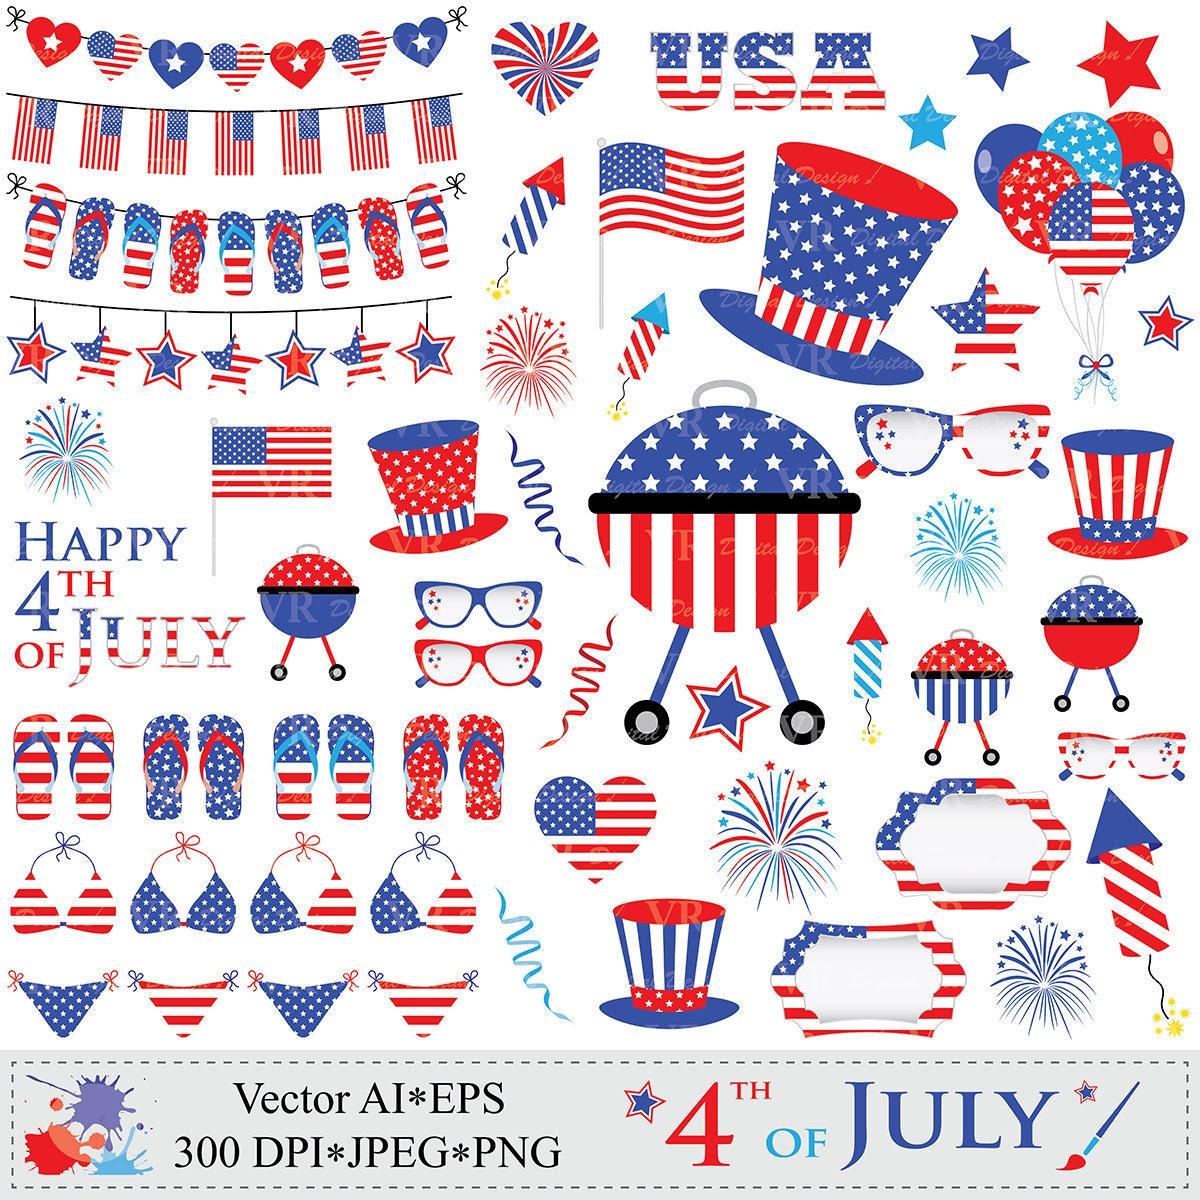 4th of July Clipart Patriotic Clip Art USA by VRDigitalDesign